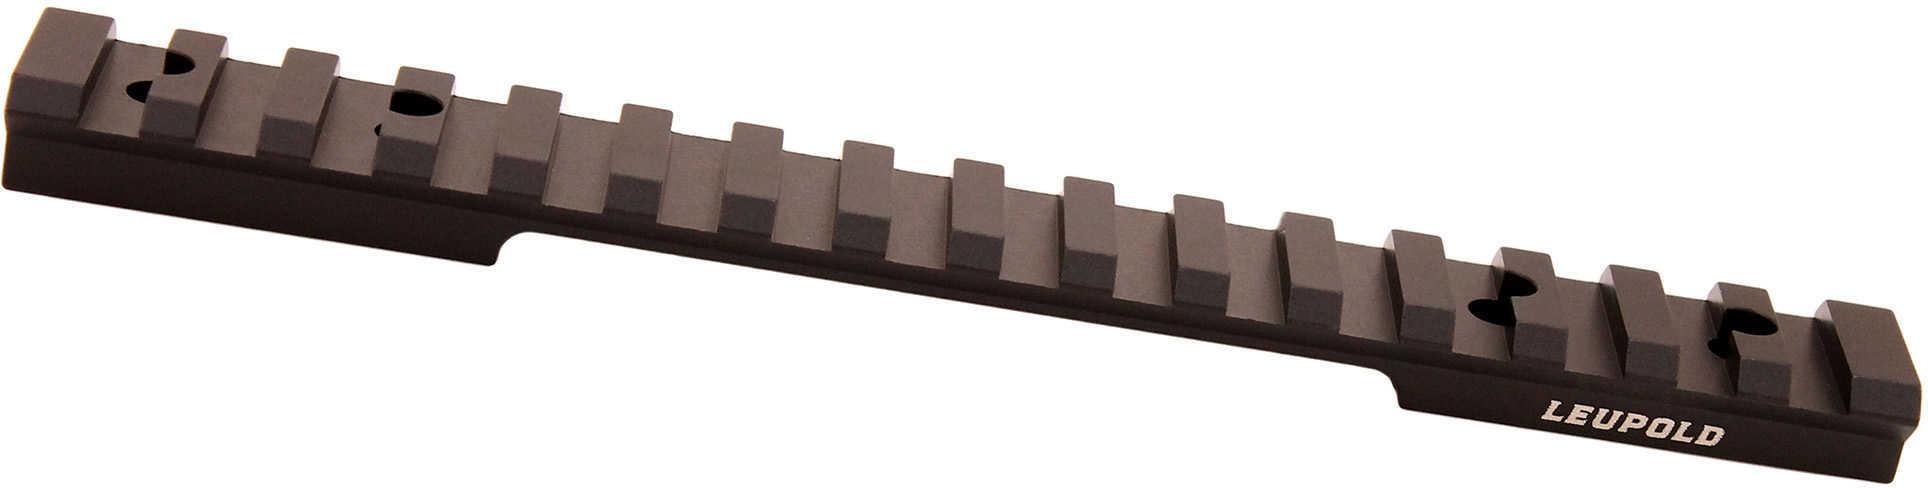 Leupold BackCountry Cross-Slot 1 Piece Base Weatherby Mark 5/Vanguard, Long Action, Matte Black Md: 171354